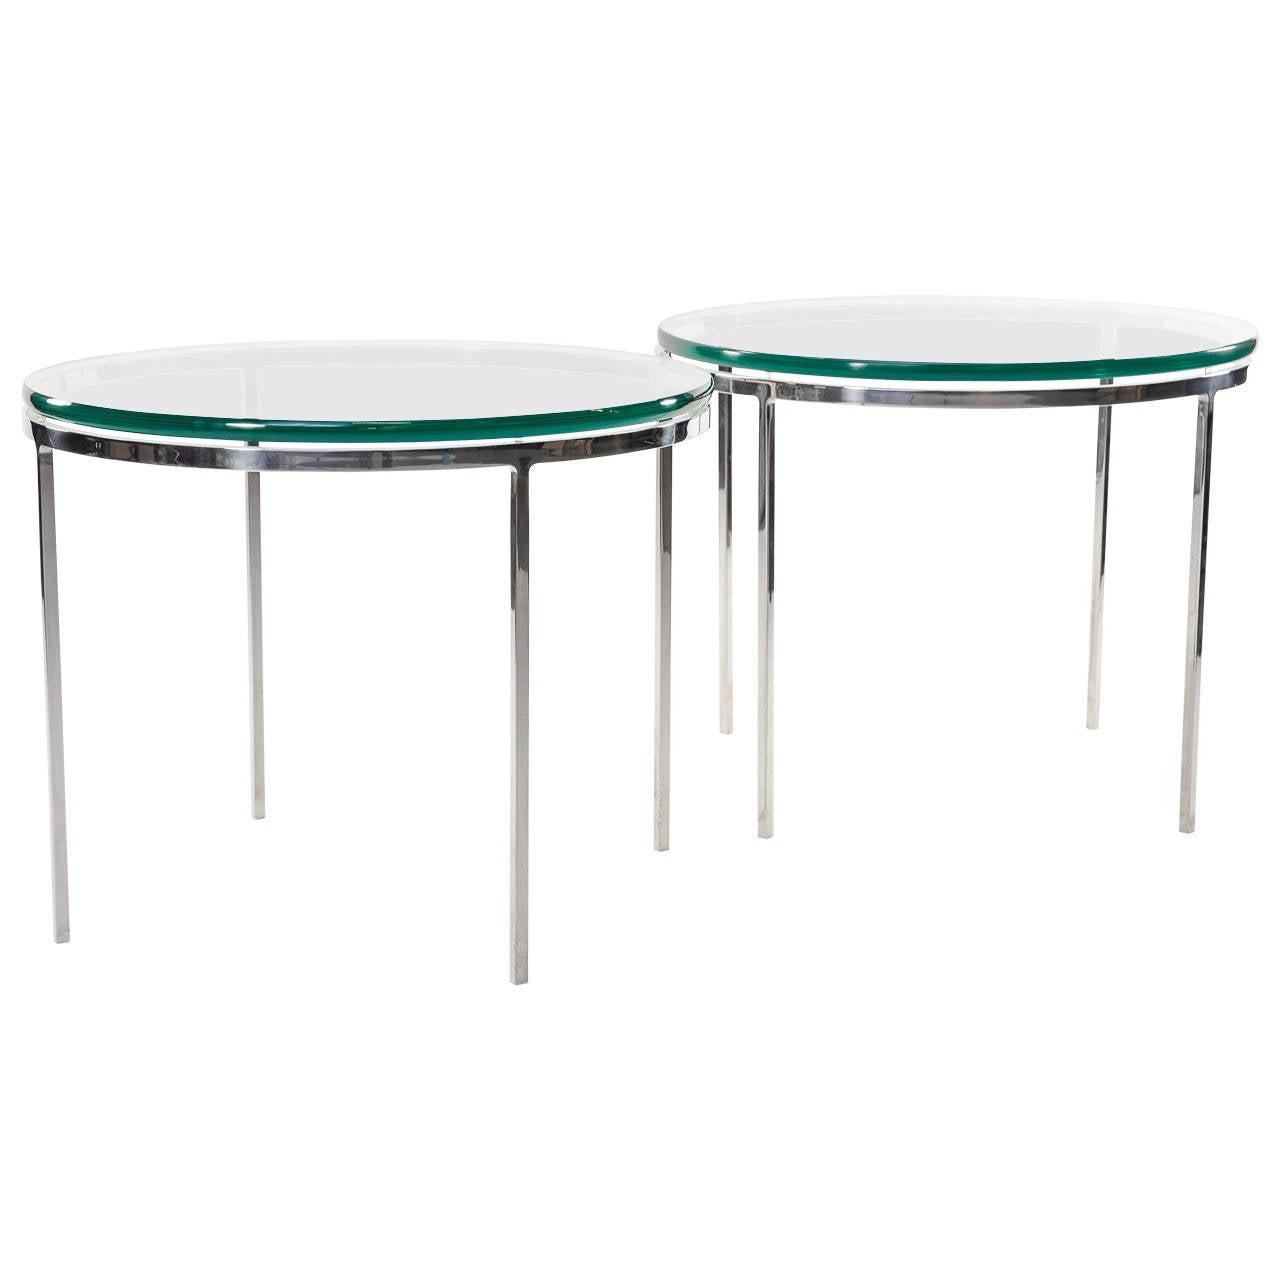 vintage pair of nicos zographos chrome and glass end tables at stdibs - vintage pair of nicos zographos chrome and glass end tables